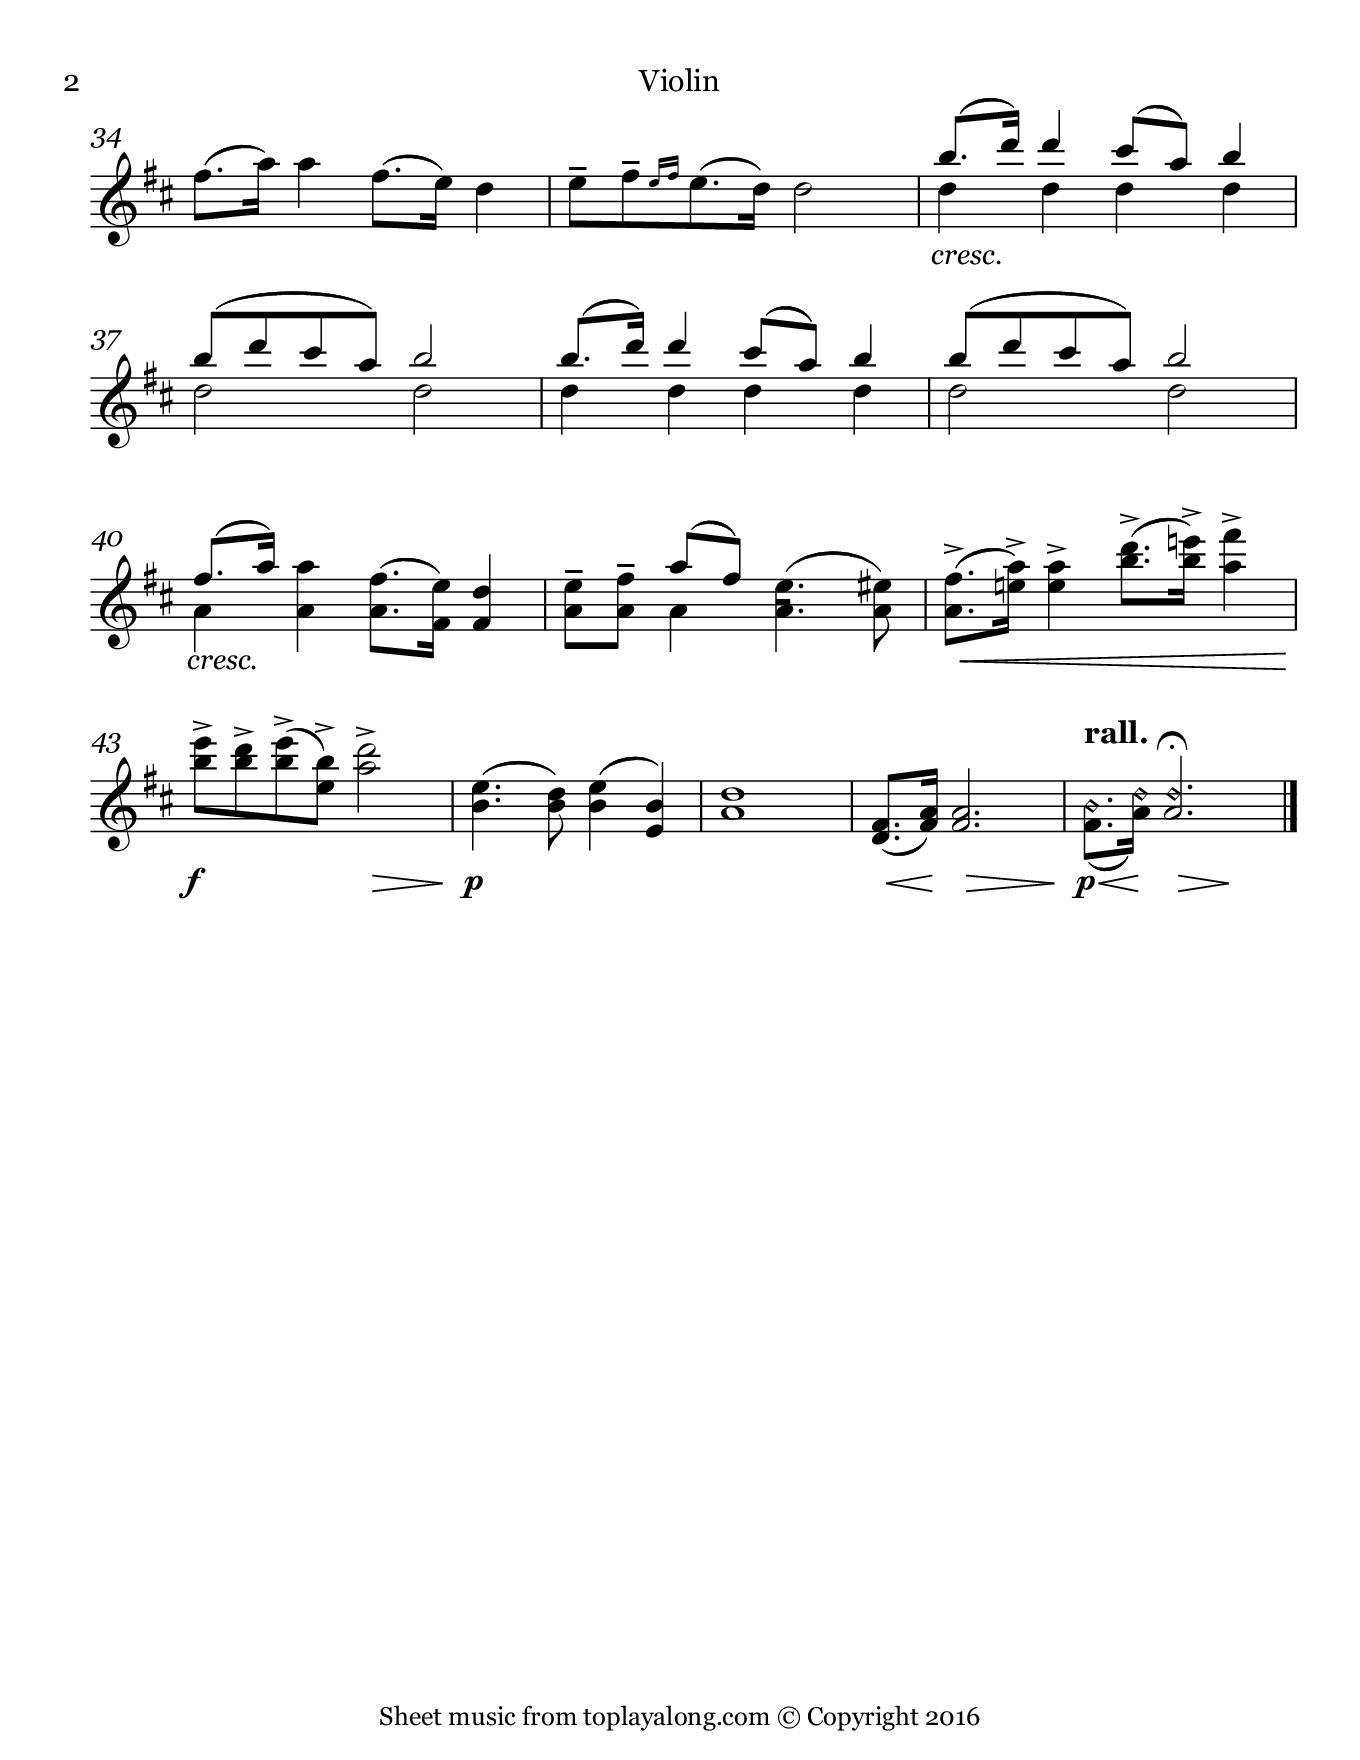 New World Symphony (II. Largo) by Dvorak. Sheet music for Violin, page 2.